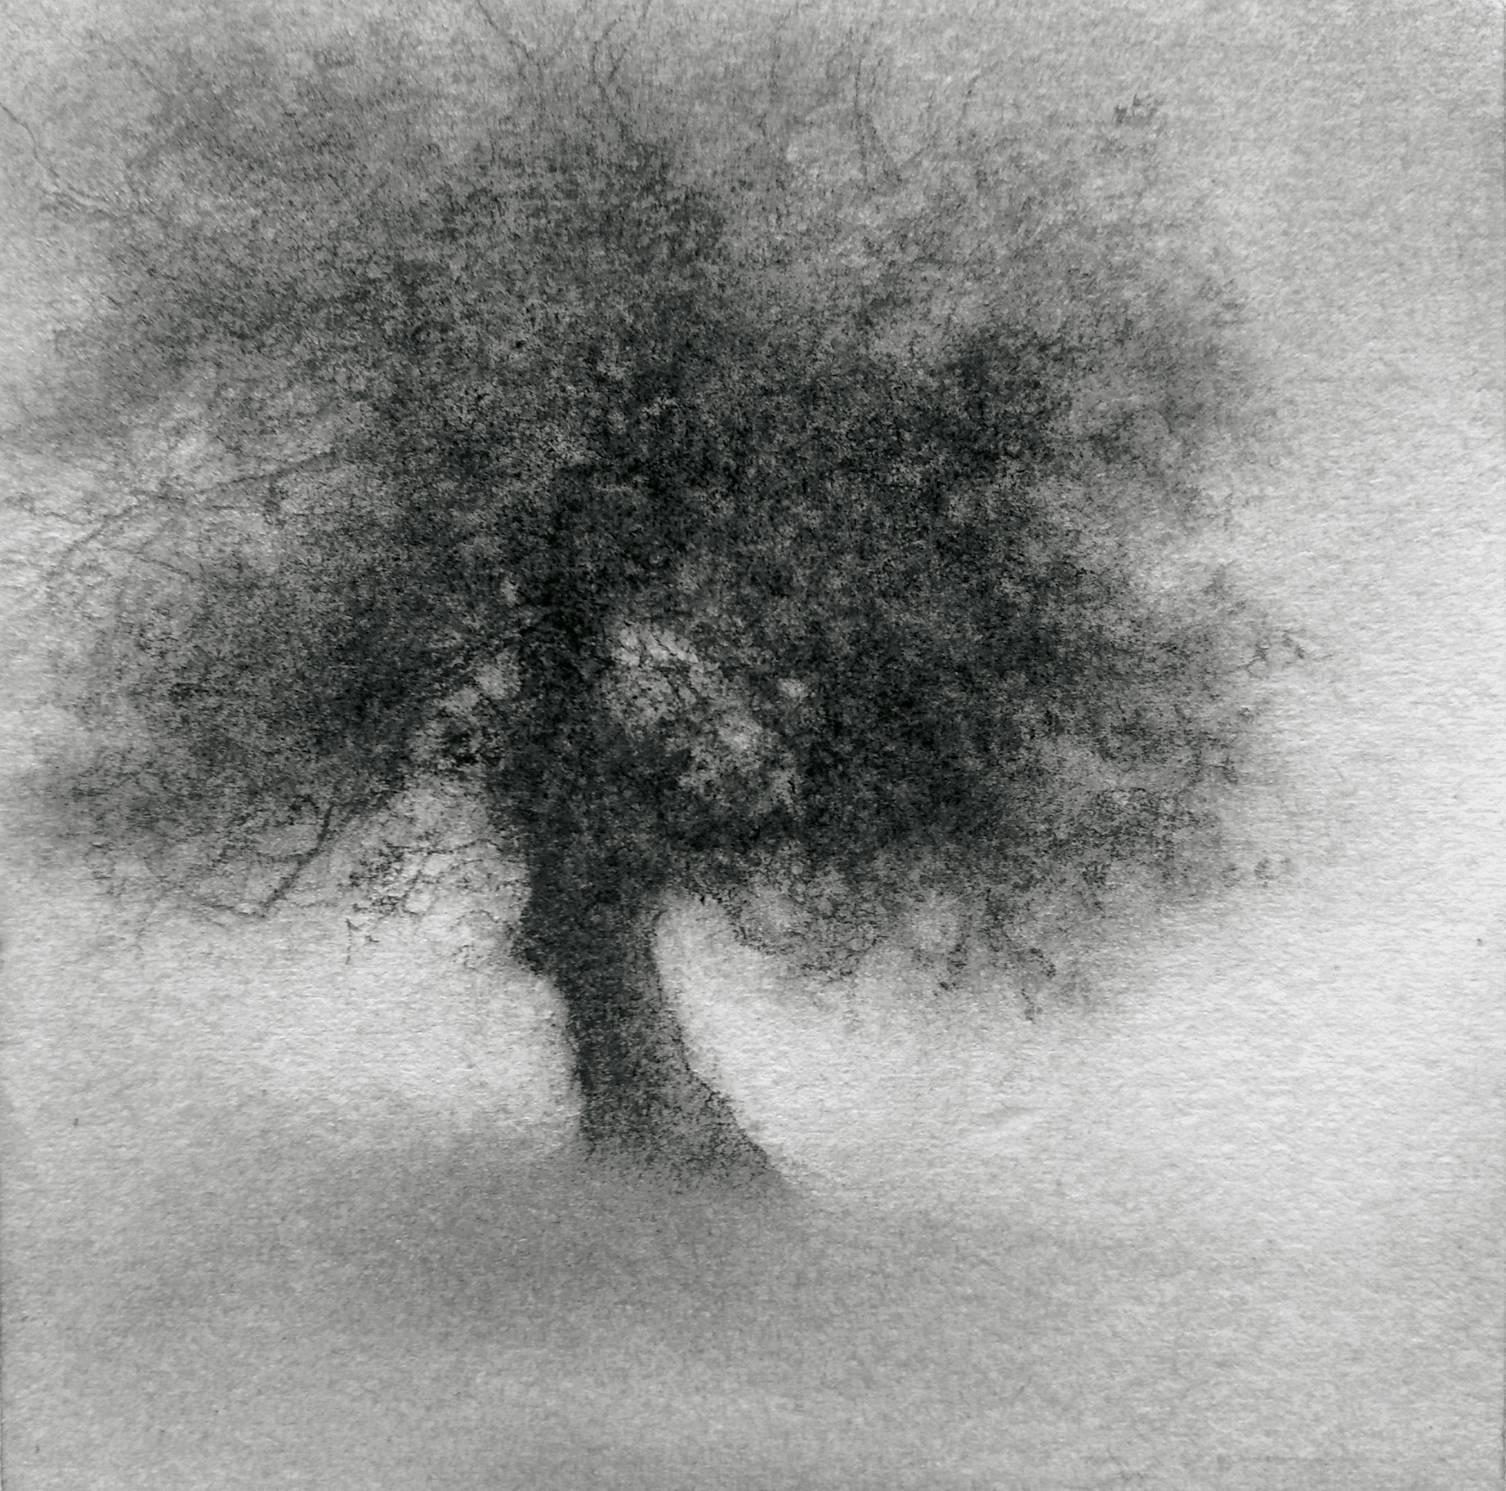 Minikin III (Modern, Small Realistic Tree Drawing on Square Wood Panel)